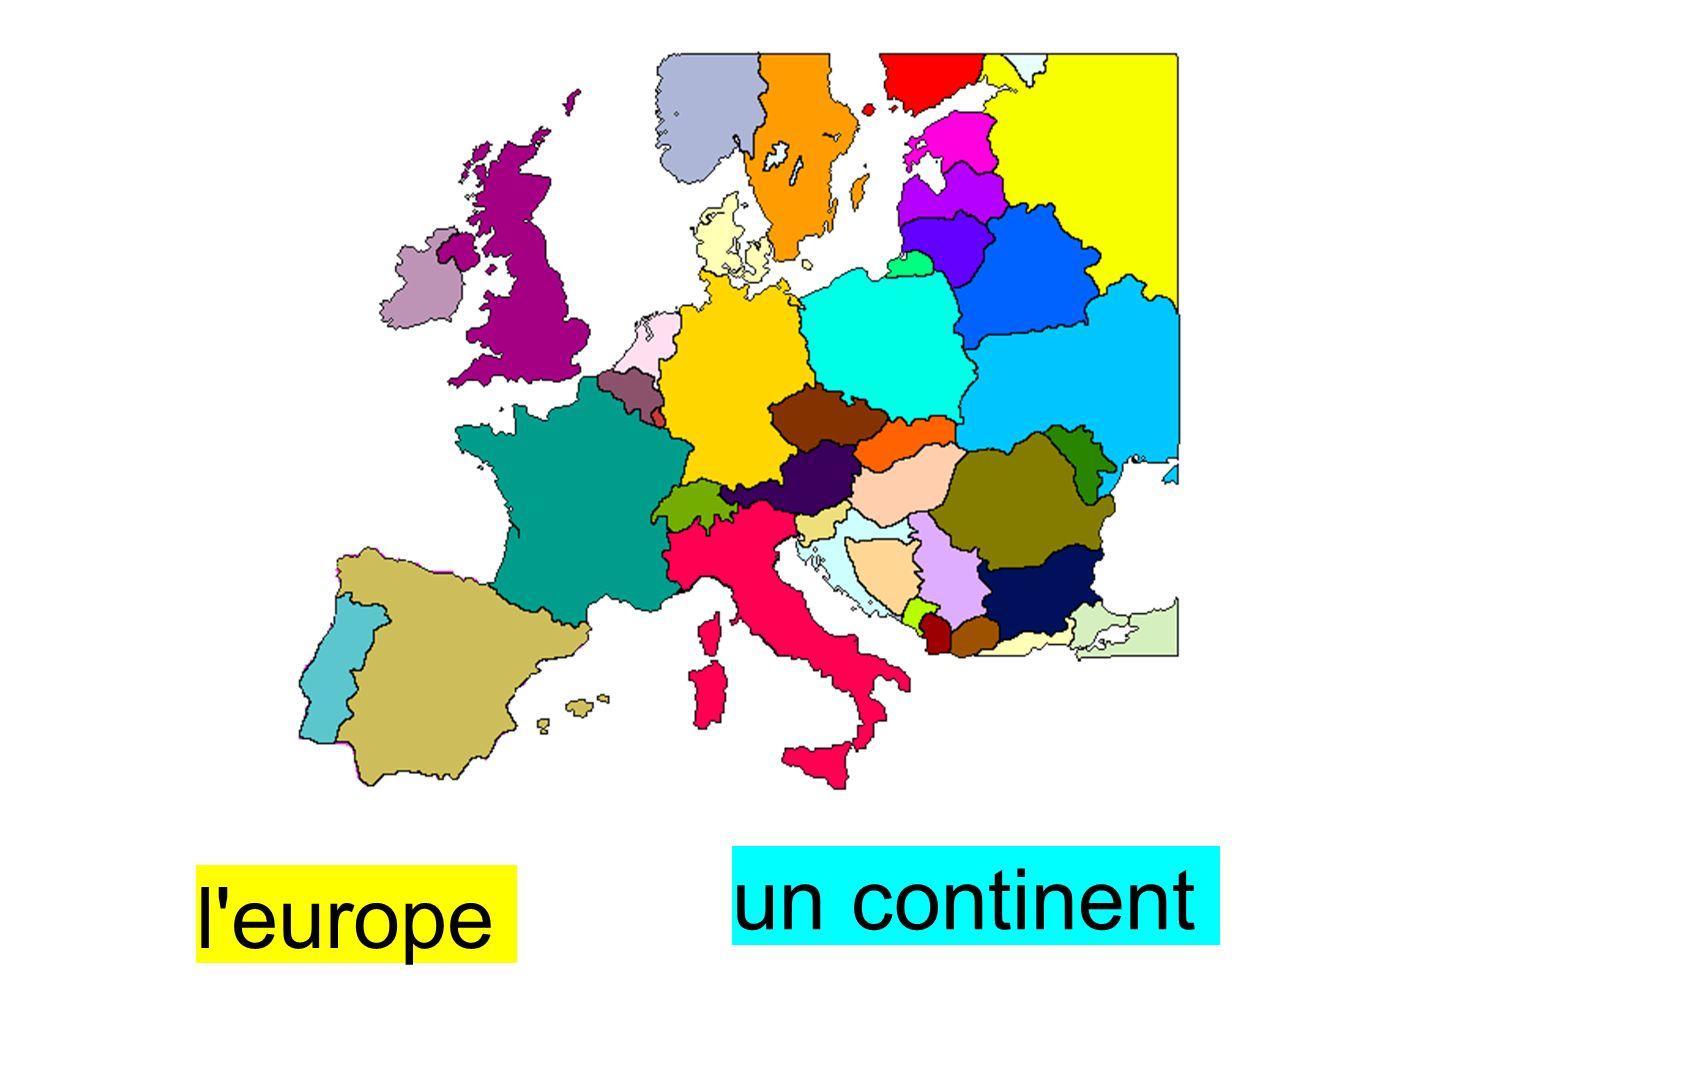 un continent l europe